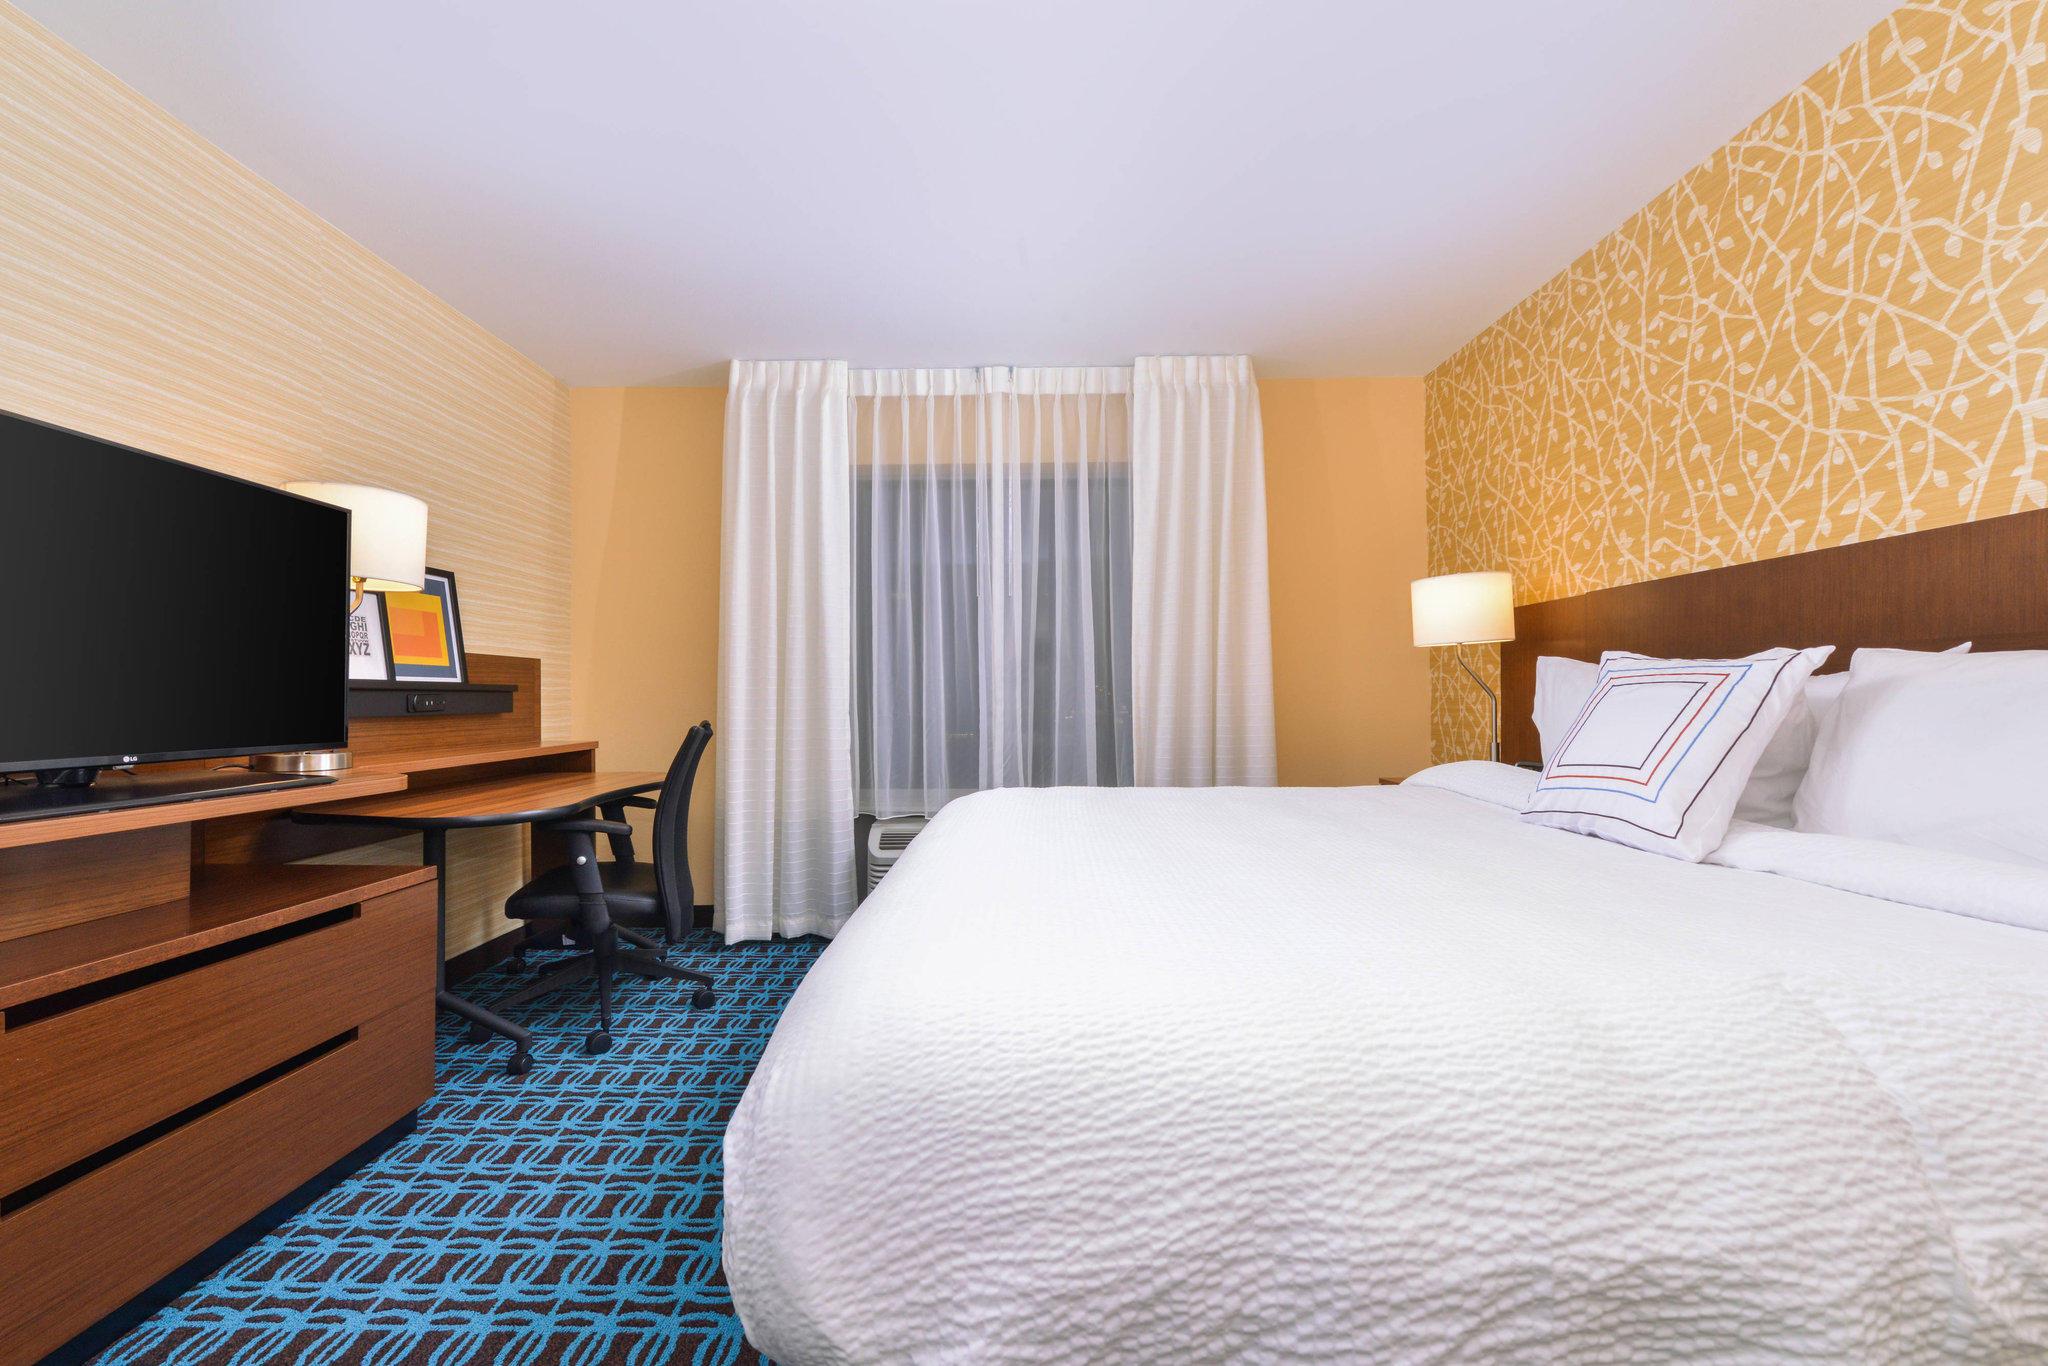 Fairfield Inn & Suites by Marriott Coralville